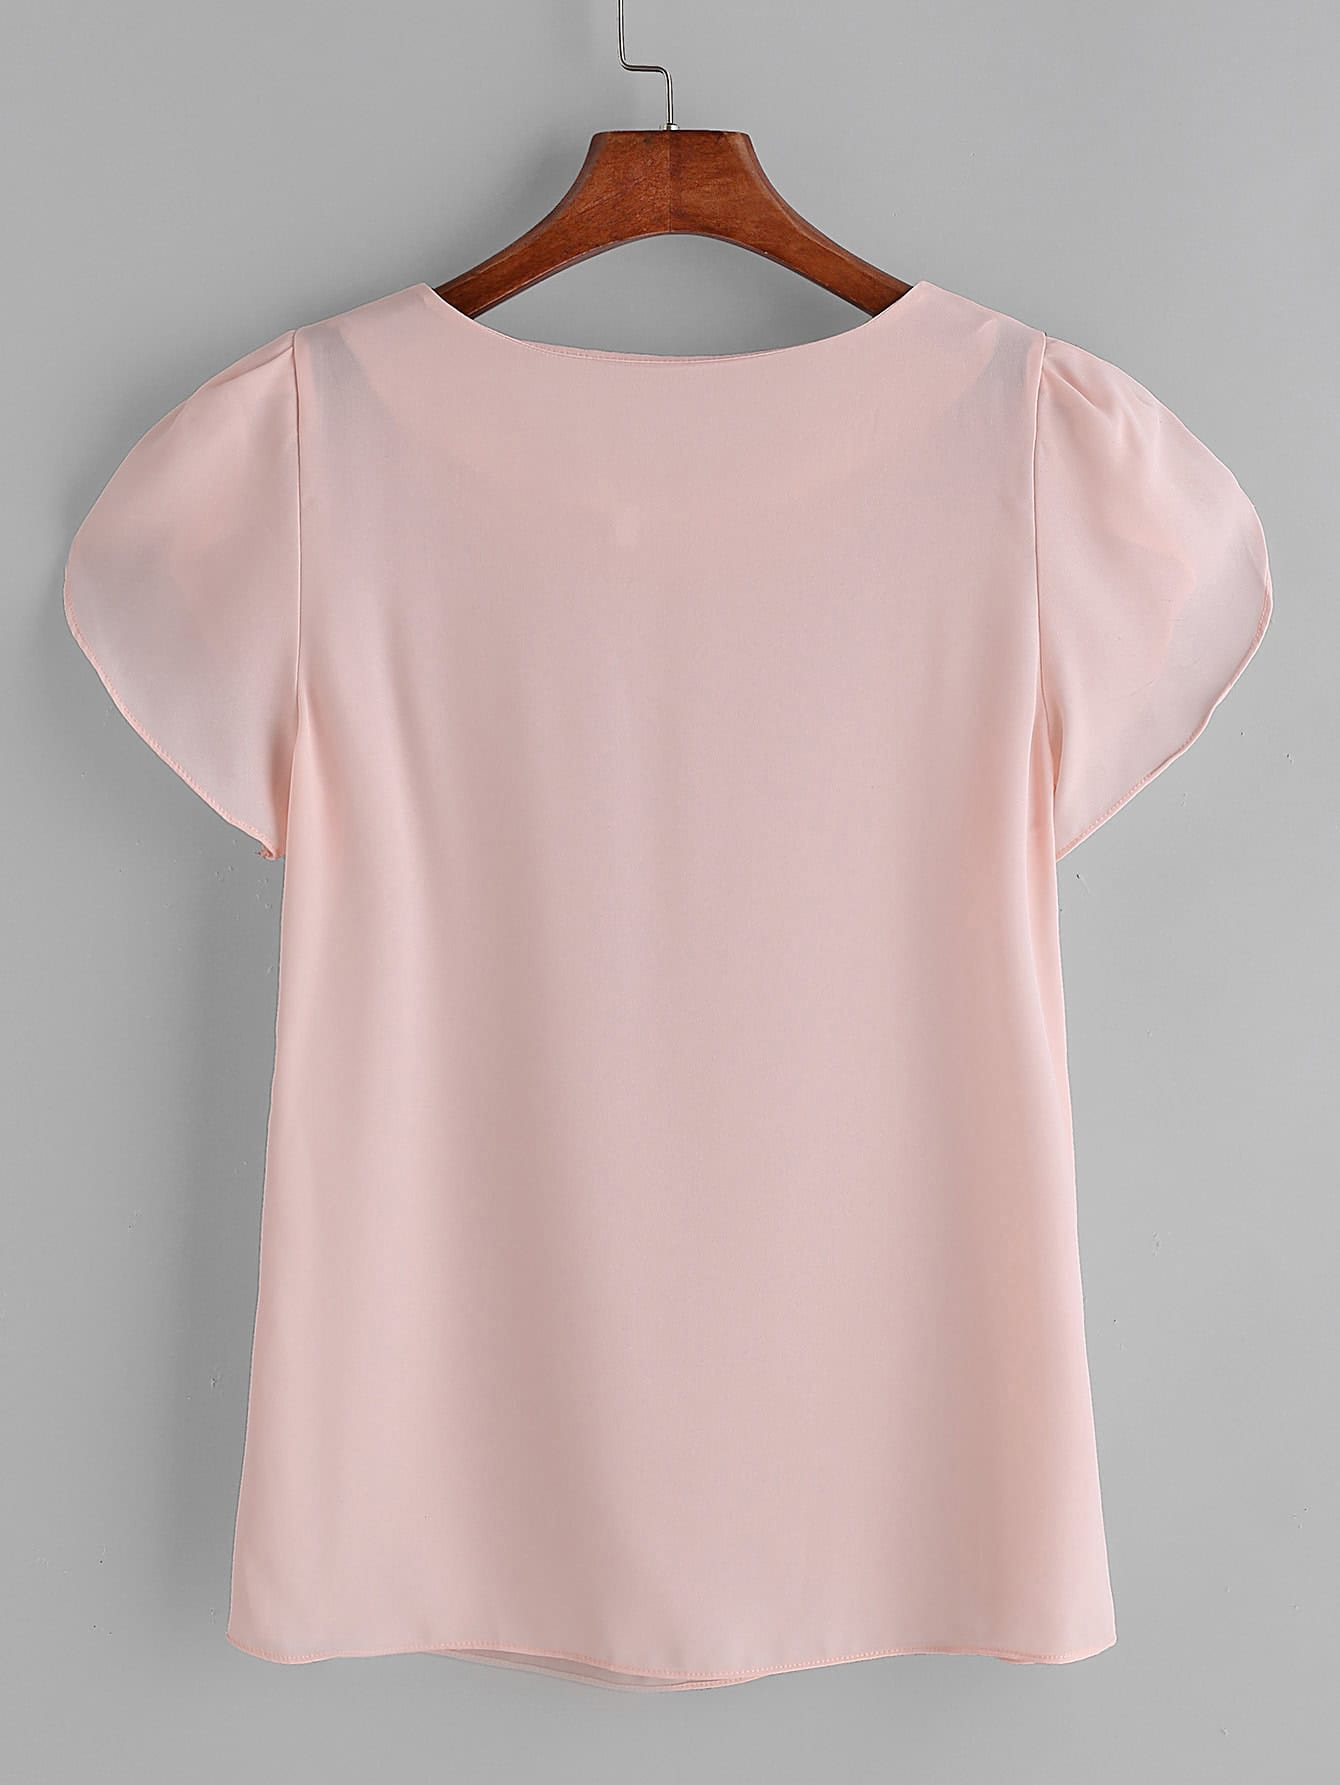 blouse170310108_2